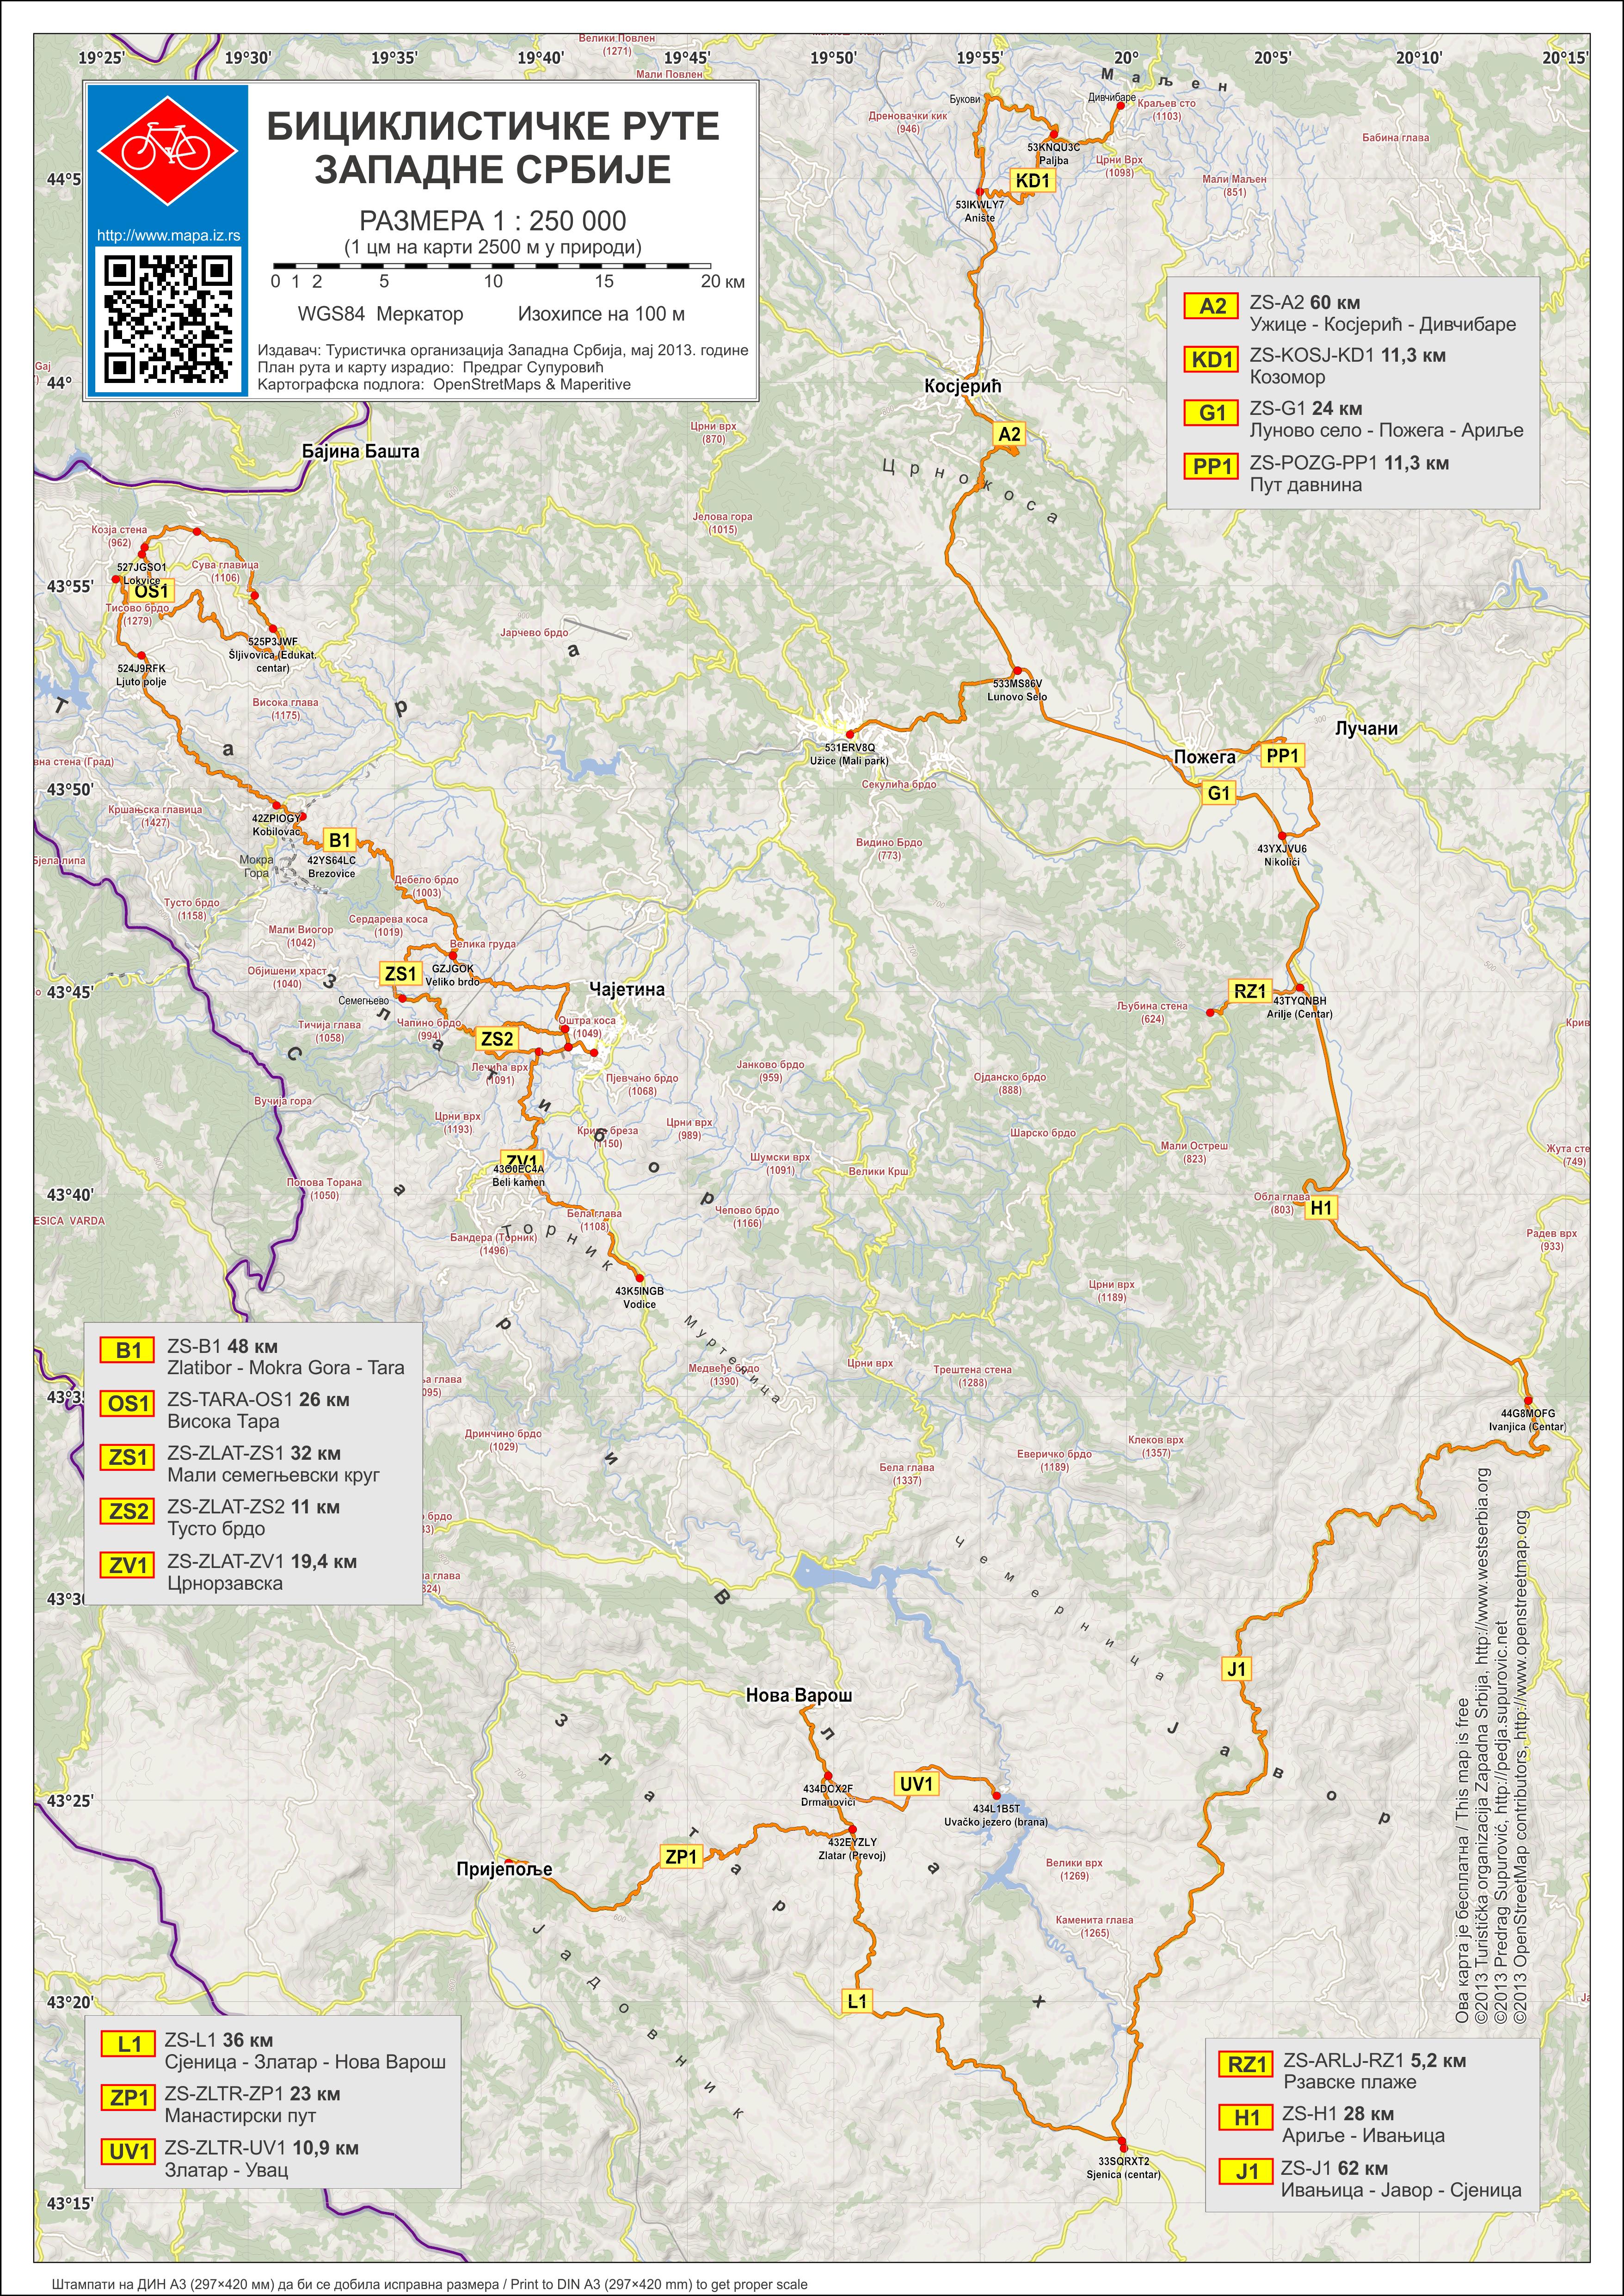 mapa zapadne srbije Пеђа Супуровић, бележница » Обележене бициклистичке руте у  mapa zapadne srbije